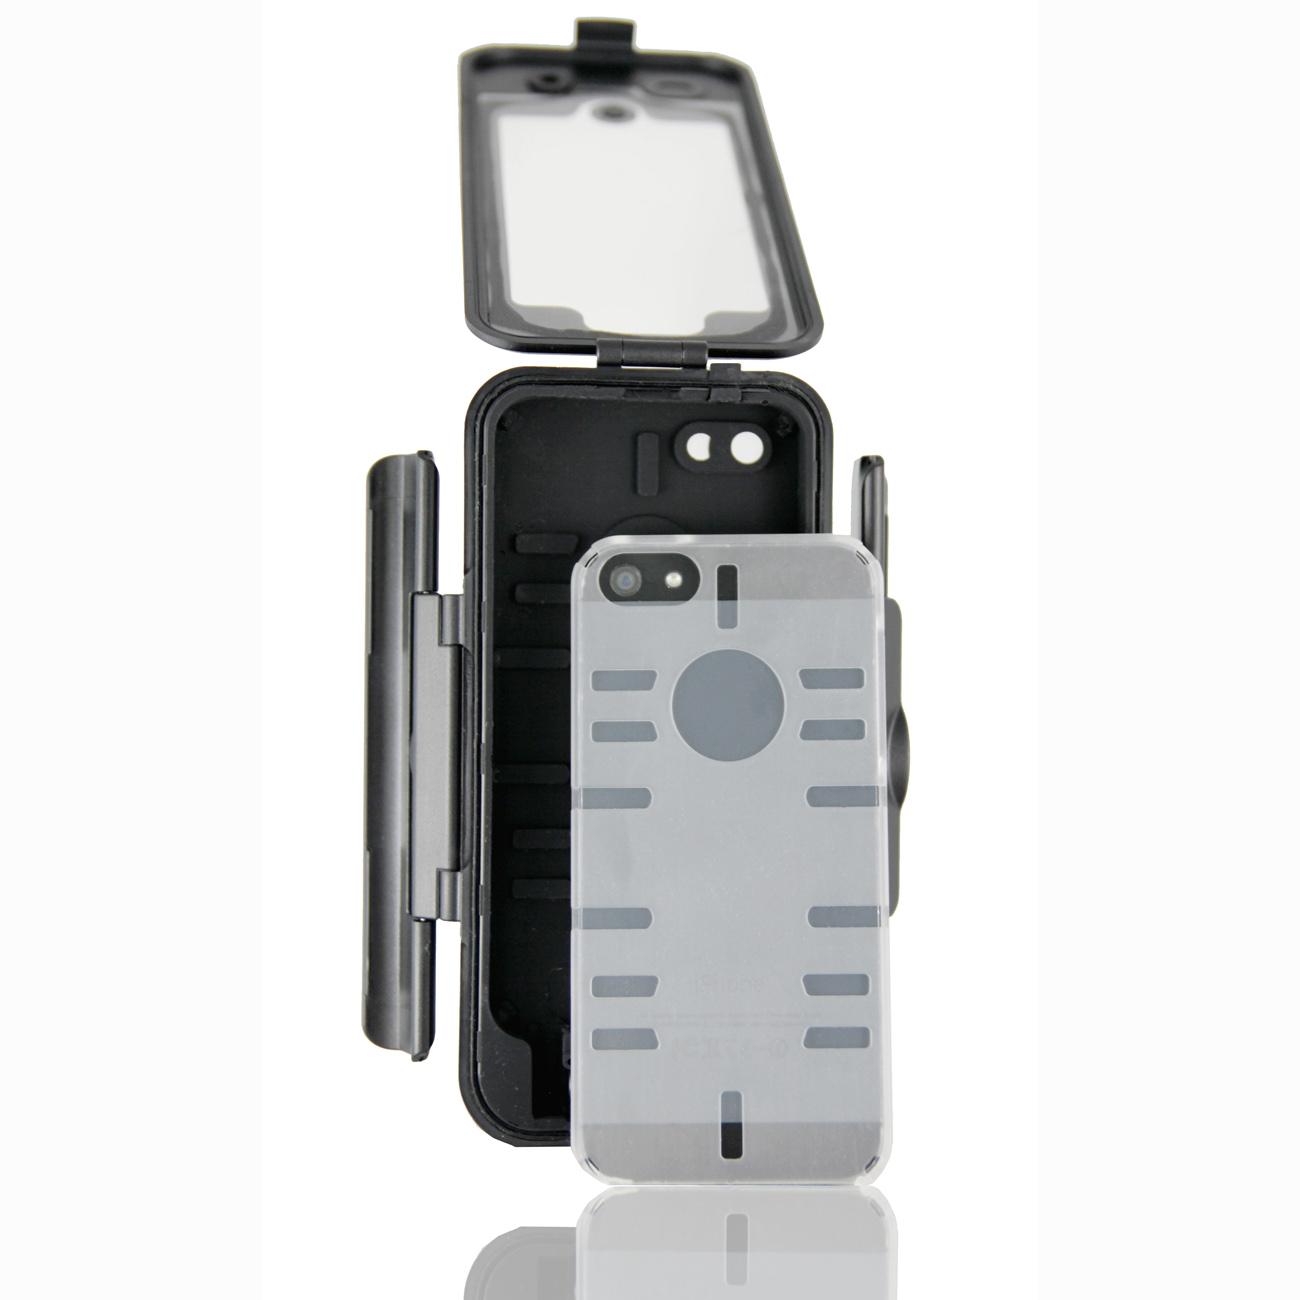 nc 17 pro shop nc 17 connect iphone 5 5s se bike case. Black Bedroom Furniture Sets. Home Design Ideas